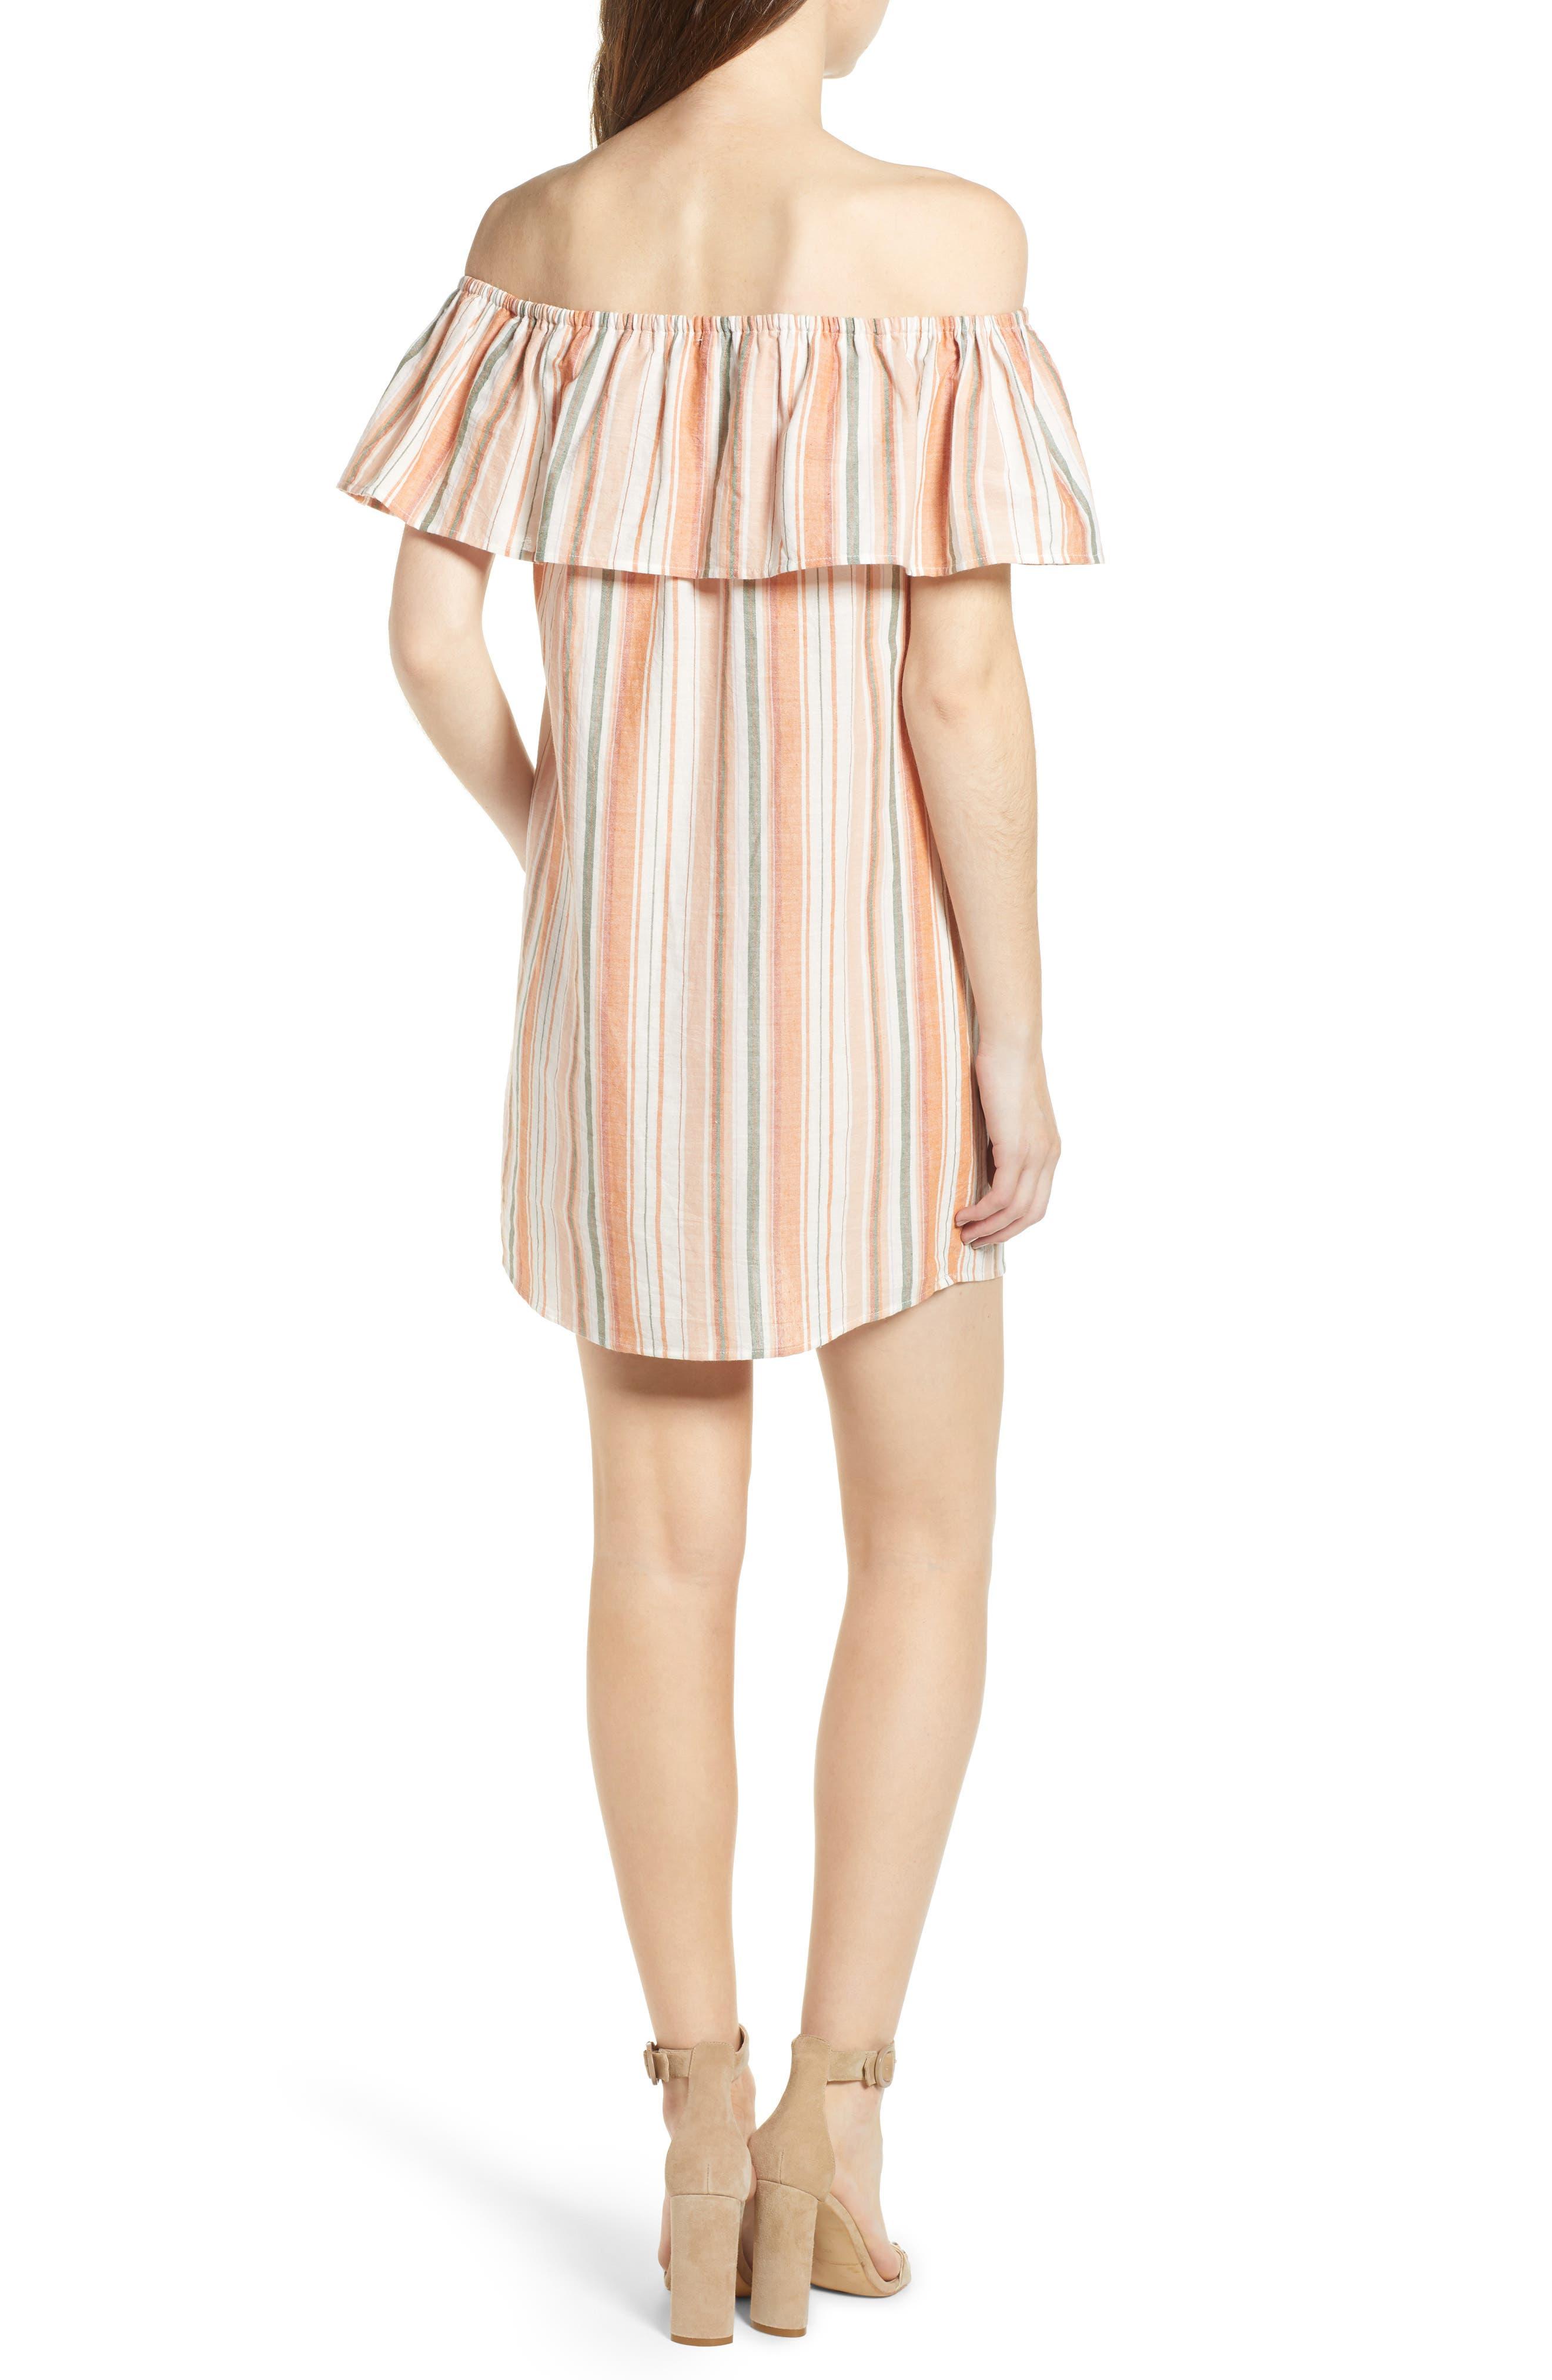 Bishop + Young Sunset Stripe Off the Shoulder Dress,                             Alternate thumbnail 2, color,                             Orange White Stripe